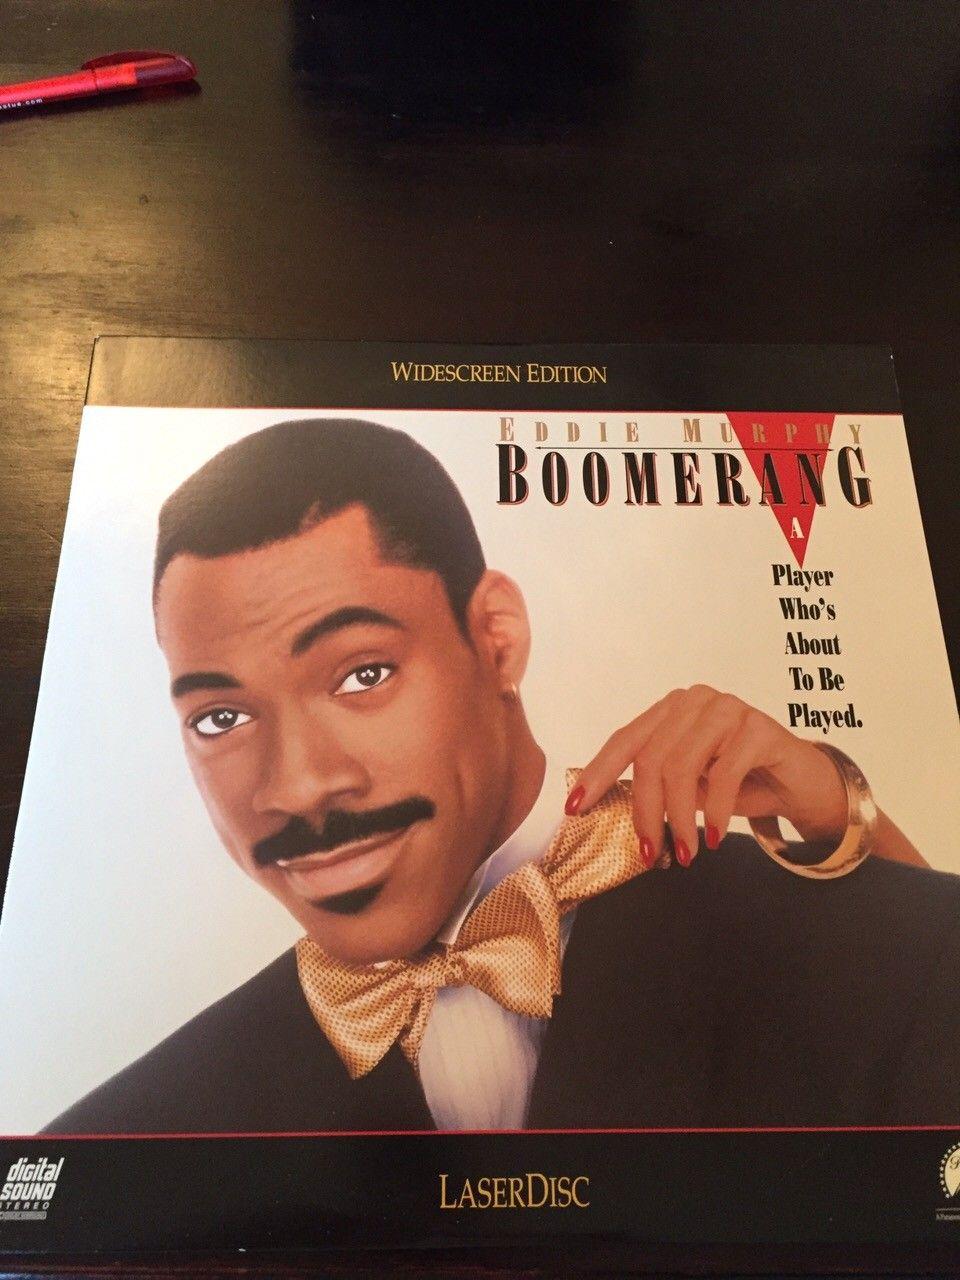 Laserdisc - Langesund  - Boomerang, Laserdisc. - Langesund